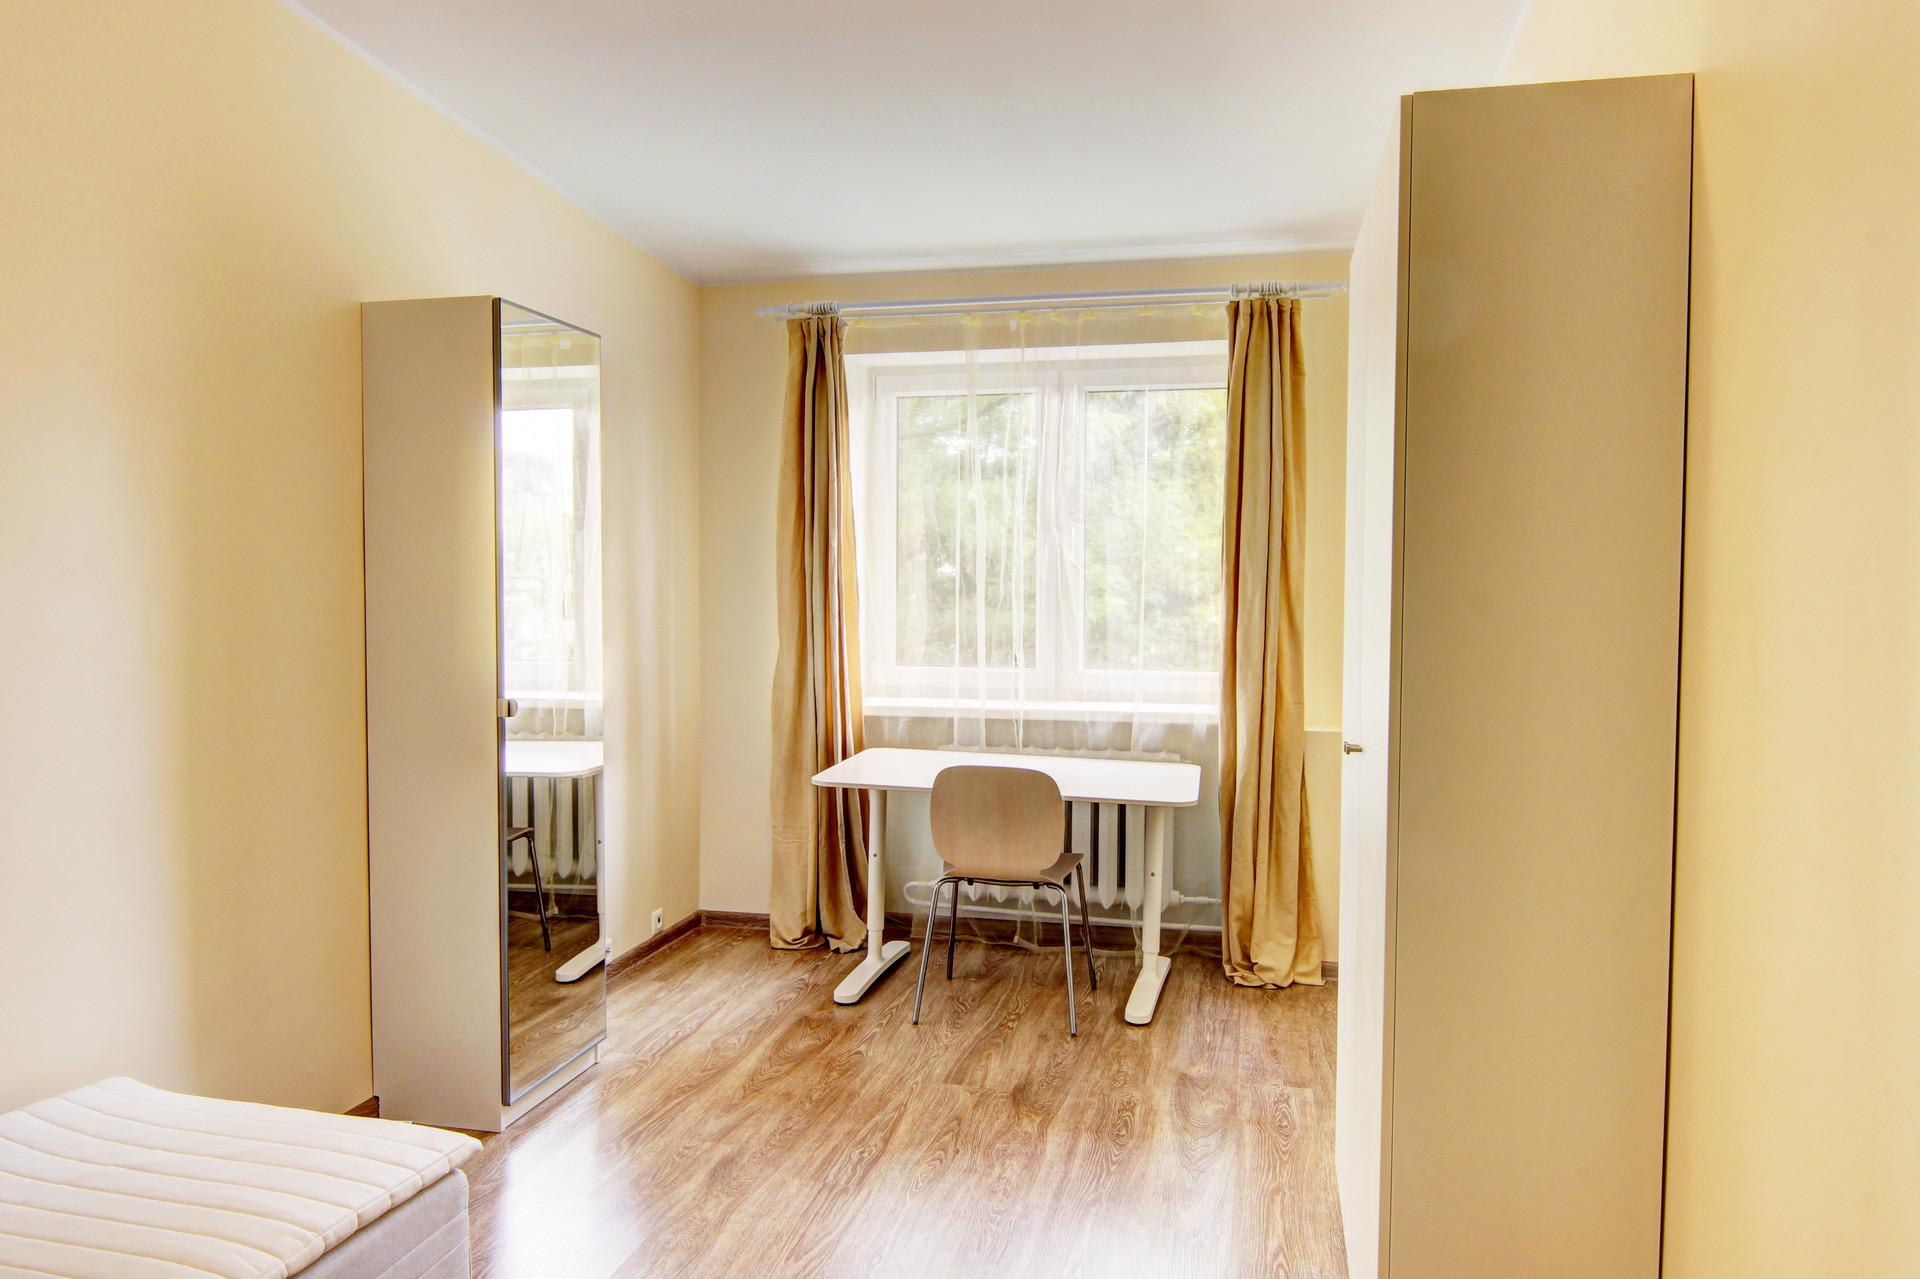 Astounding Spacious Room In 4 Room Apartment Near The Universities Beutiful Home Inspiration Semekurdistantinfo